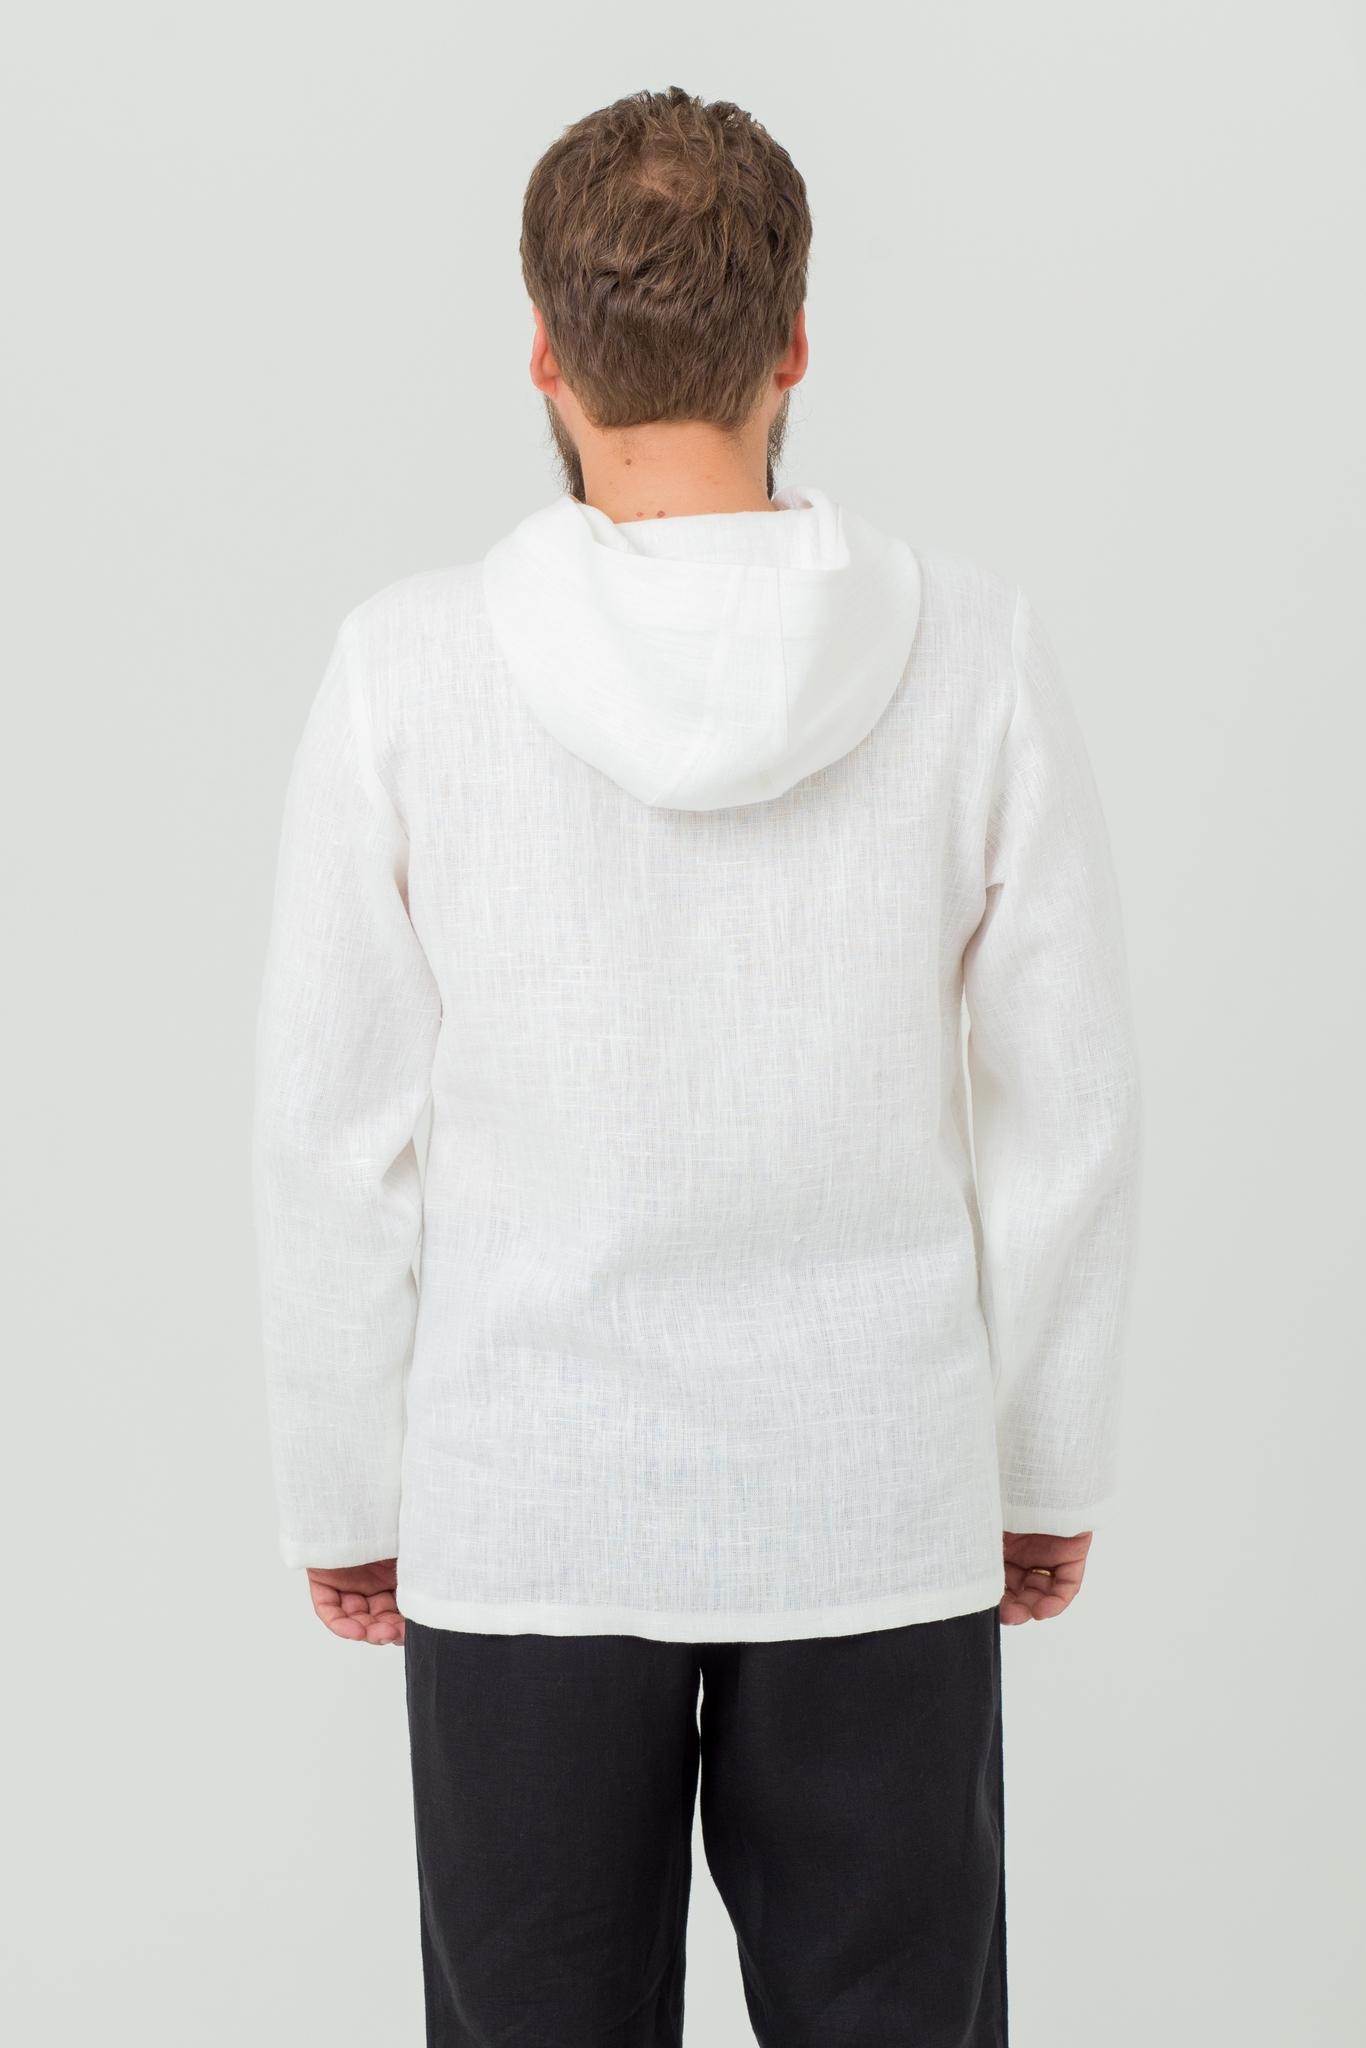 Мужская льняная рубашка с капюшоном Кузнец счастья